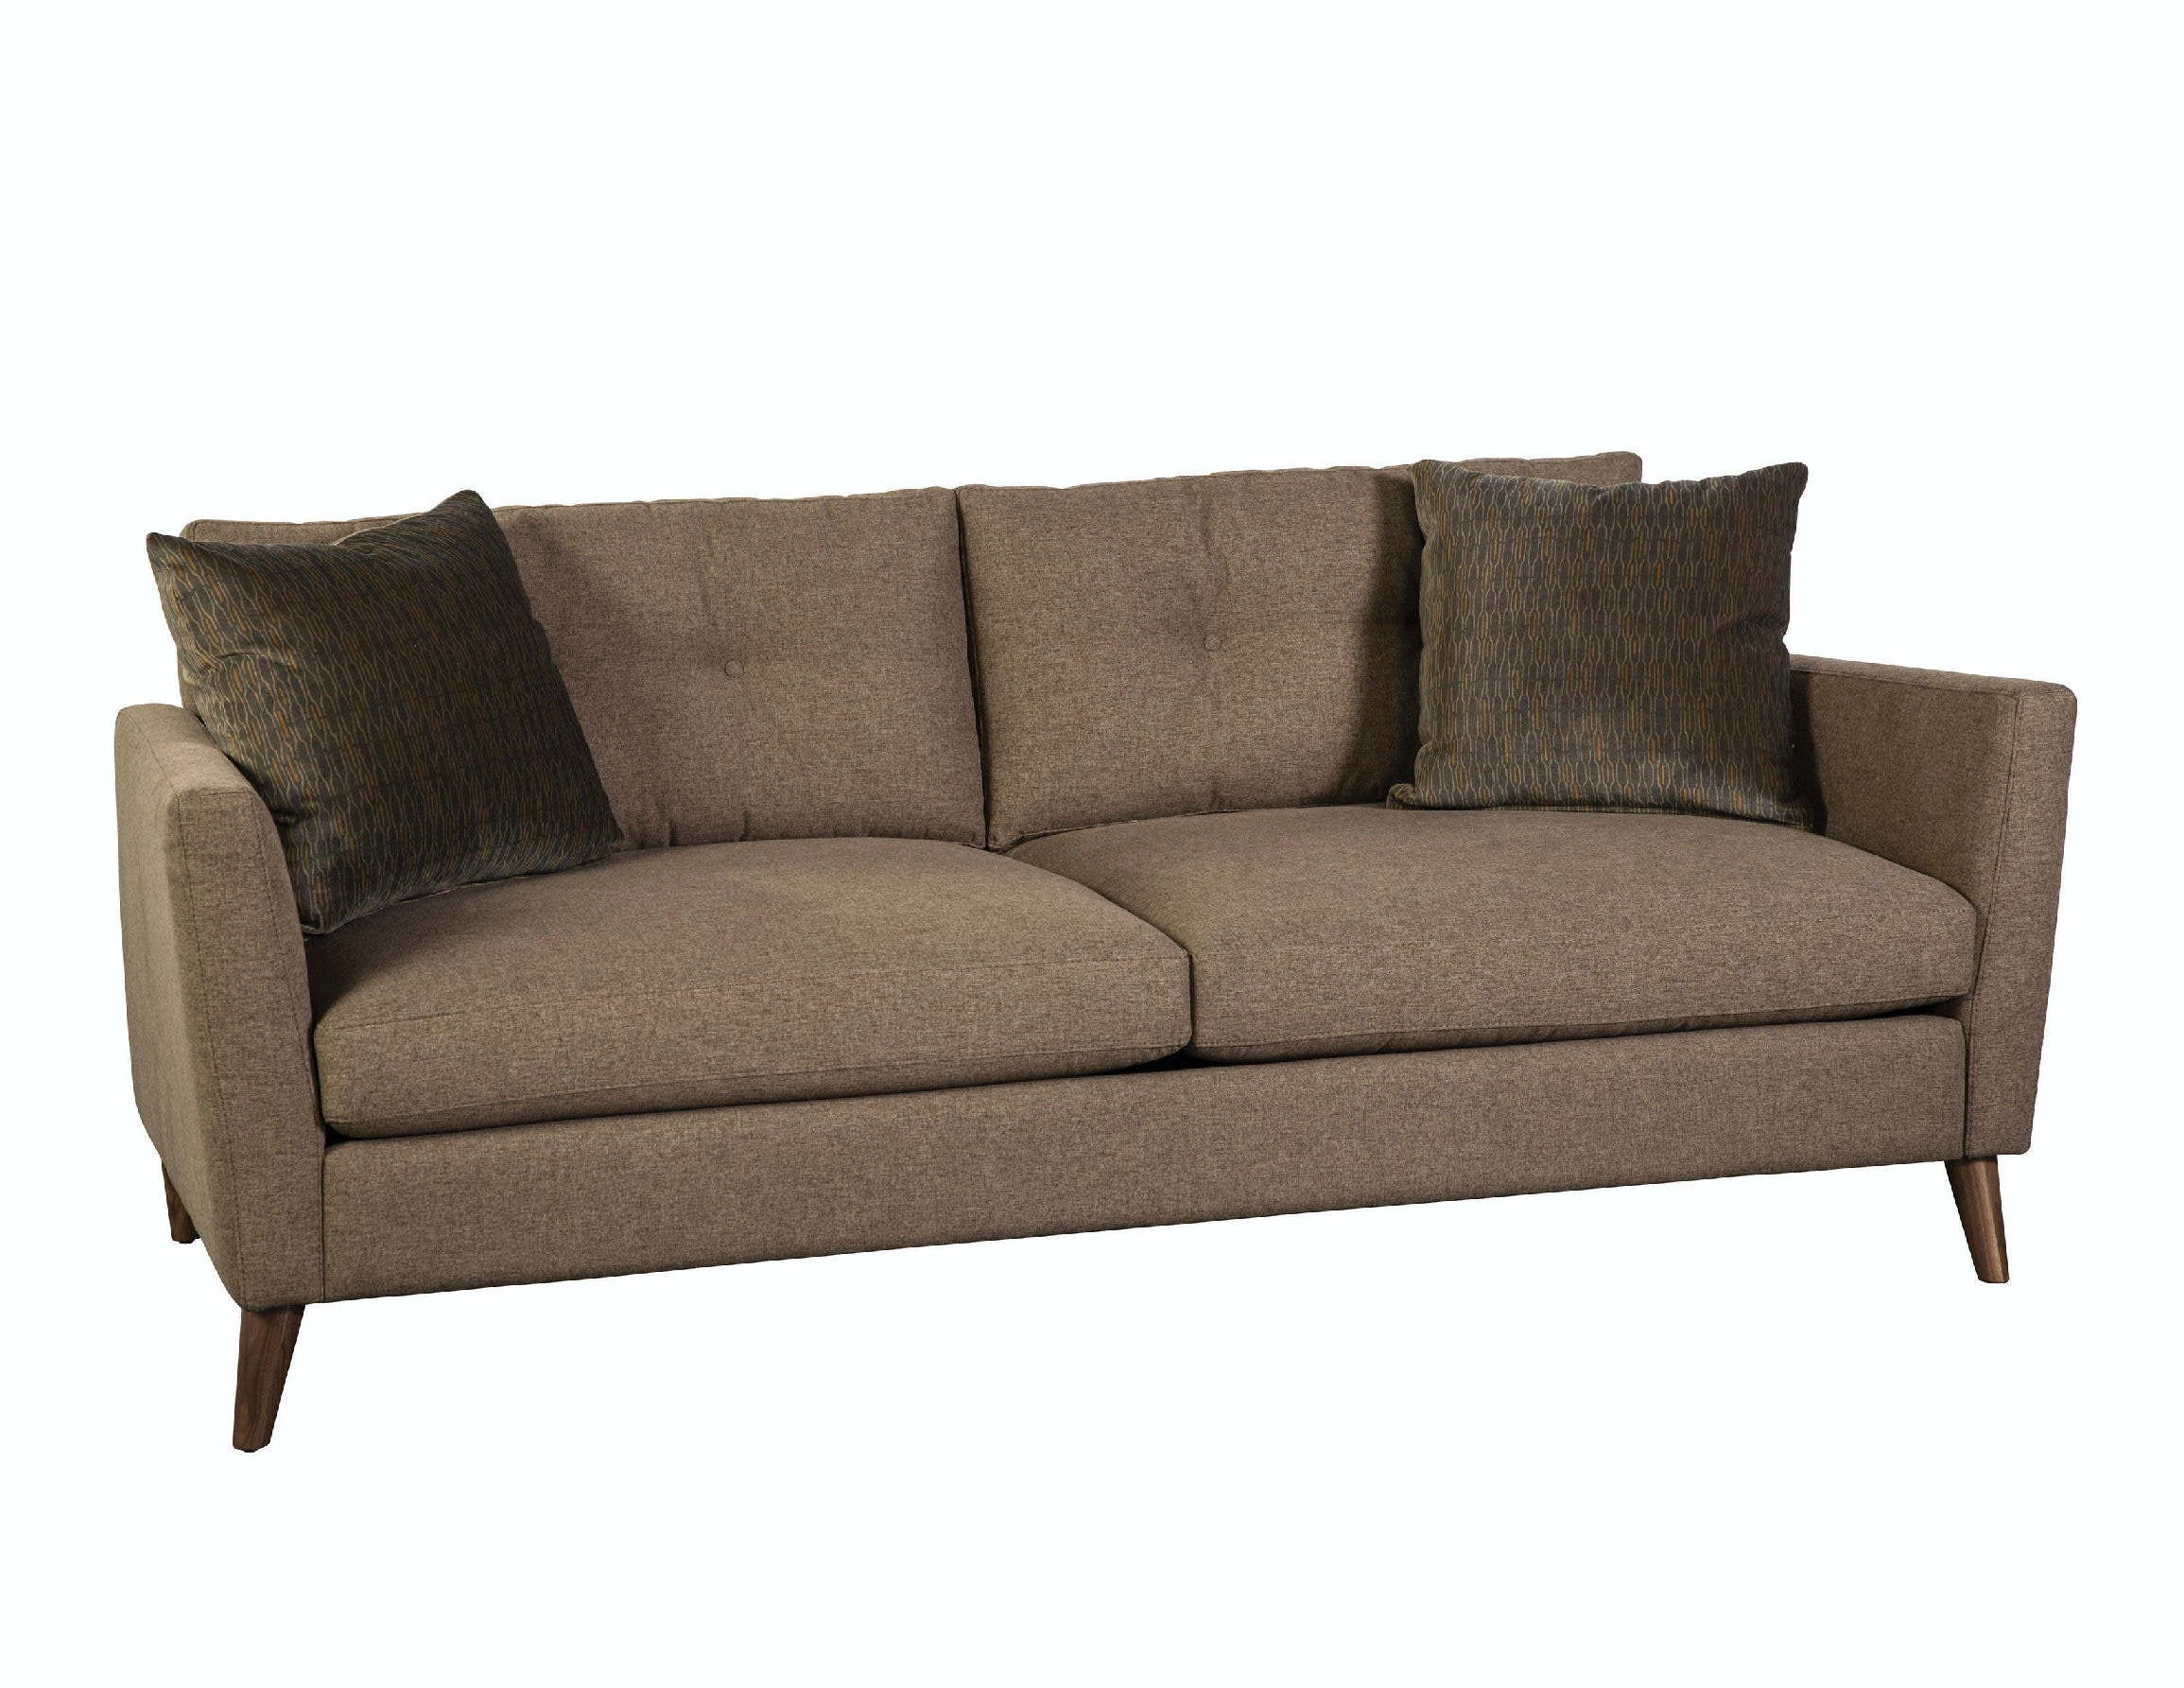 Jonathan Louis International Sofa 38330